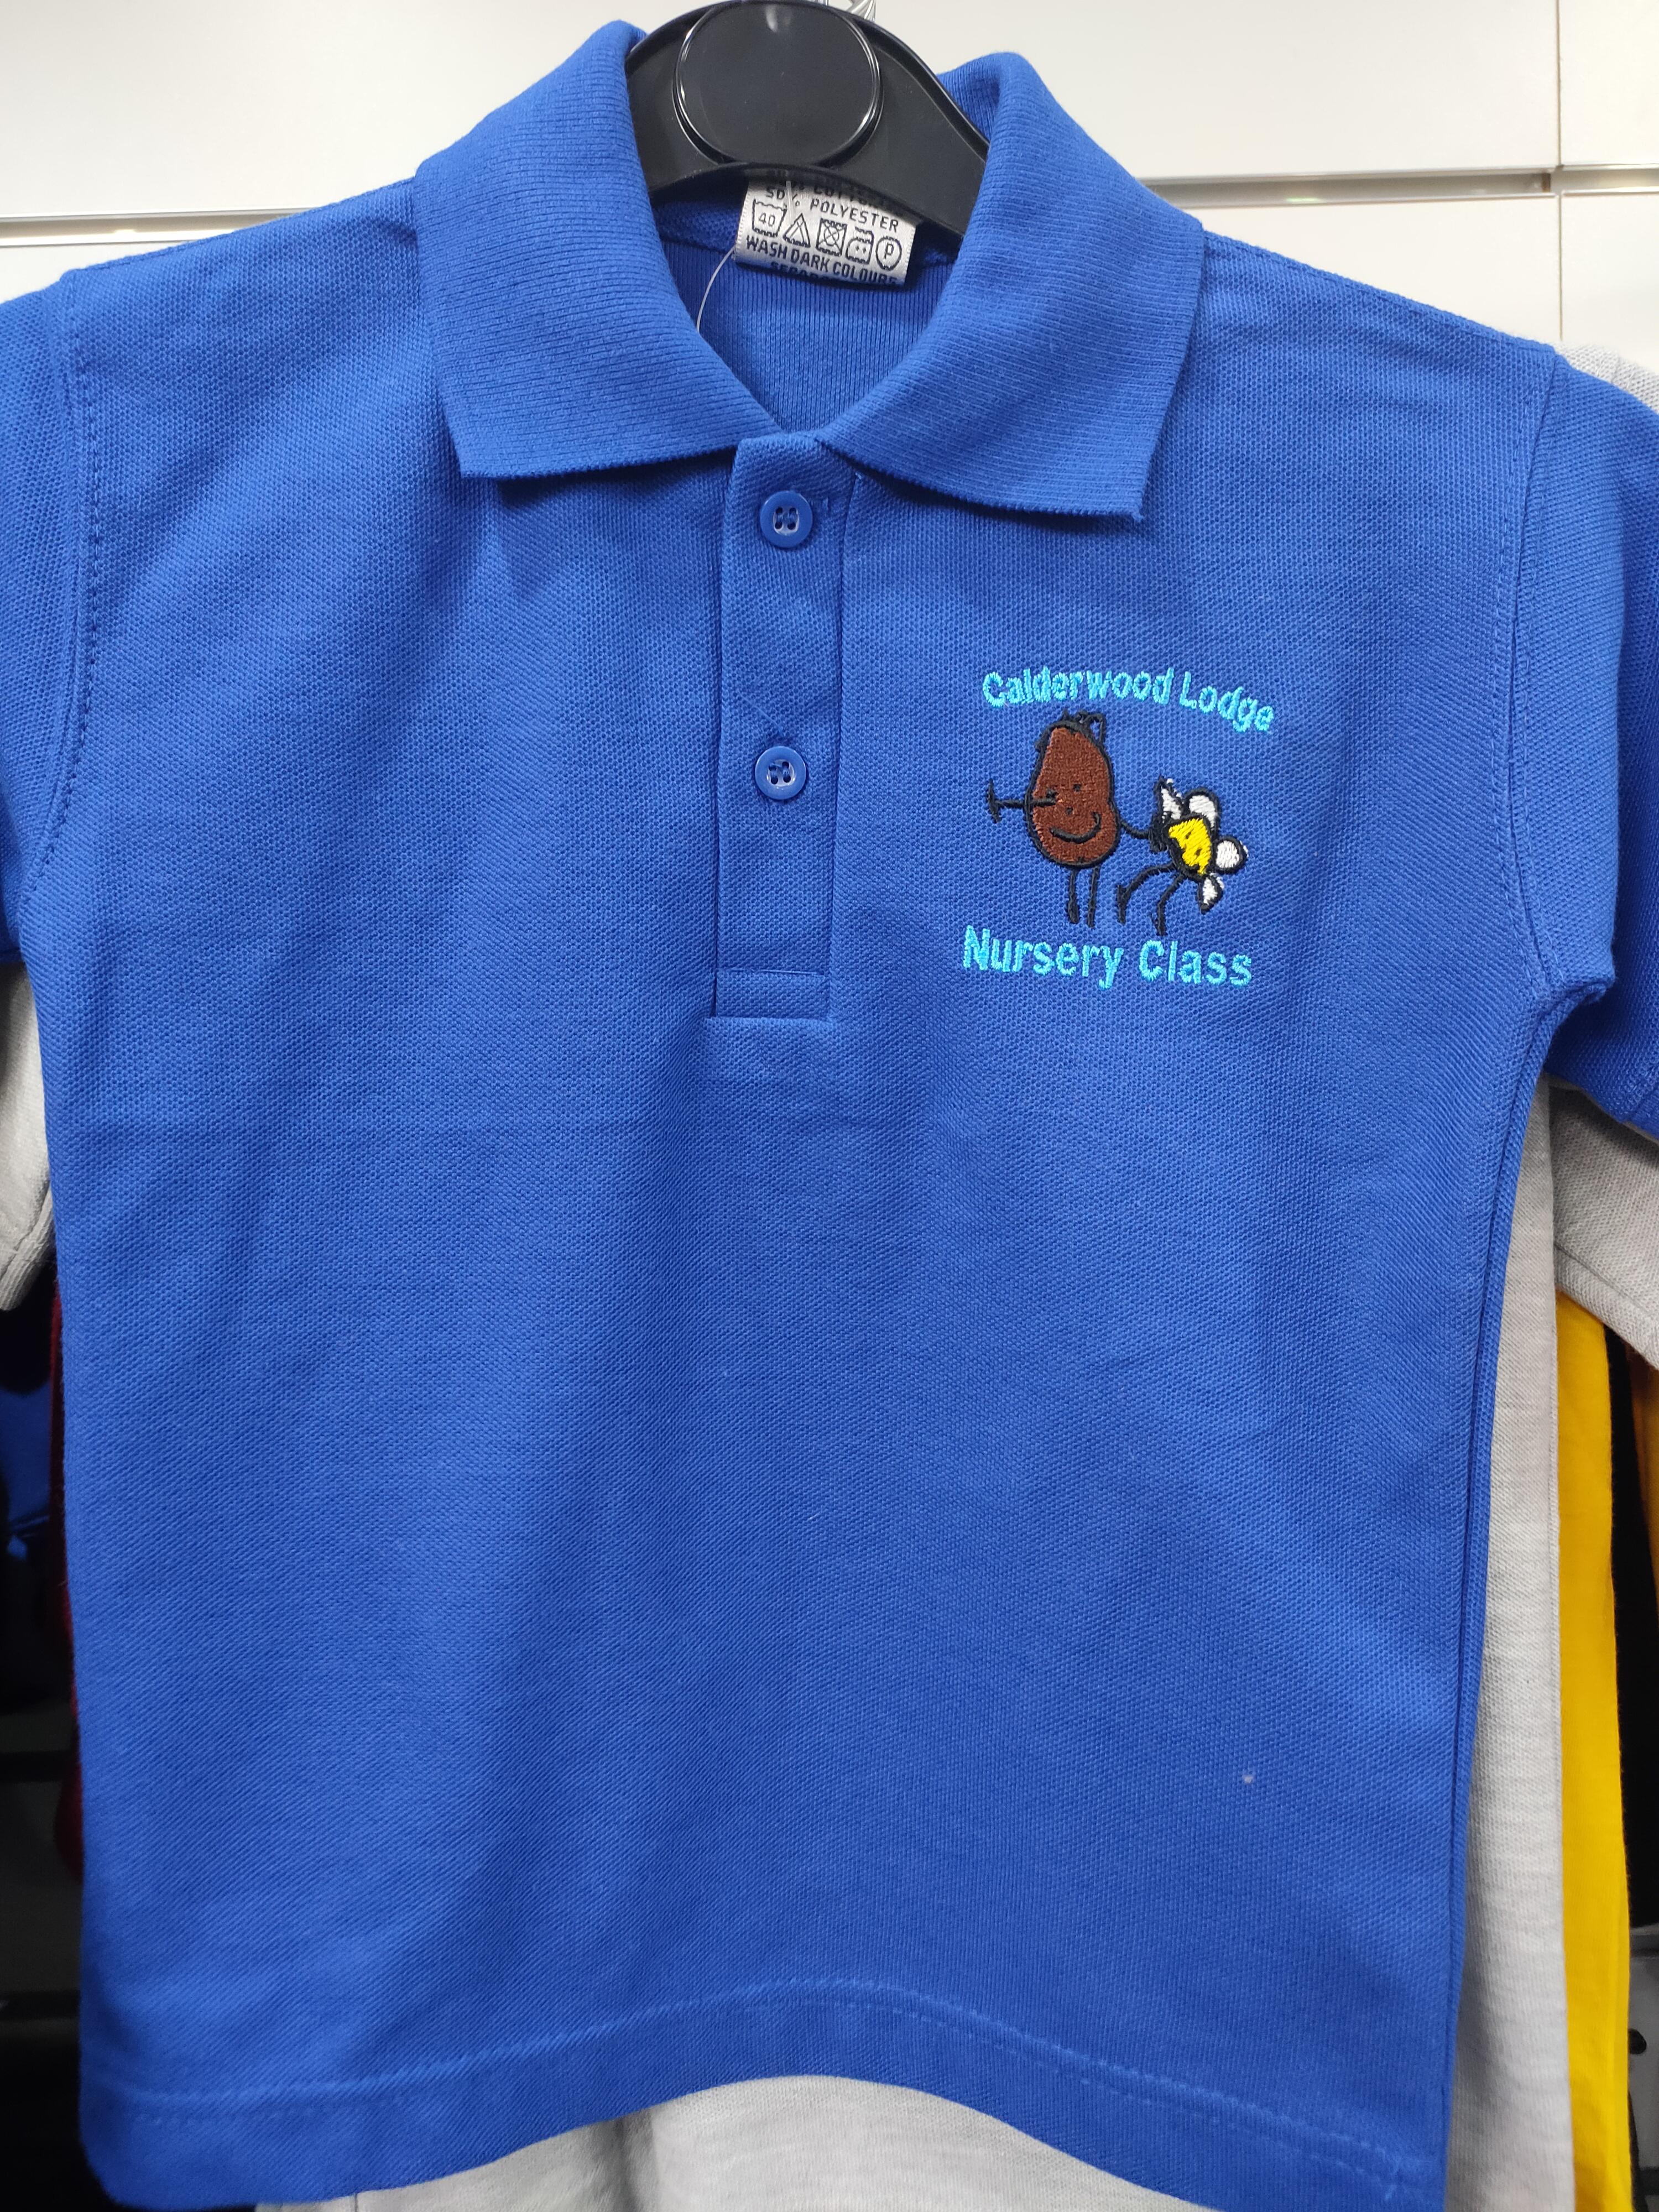 Calderwood Lodge Nursery Poloshirt